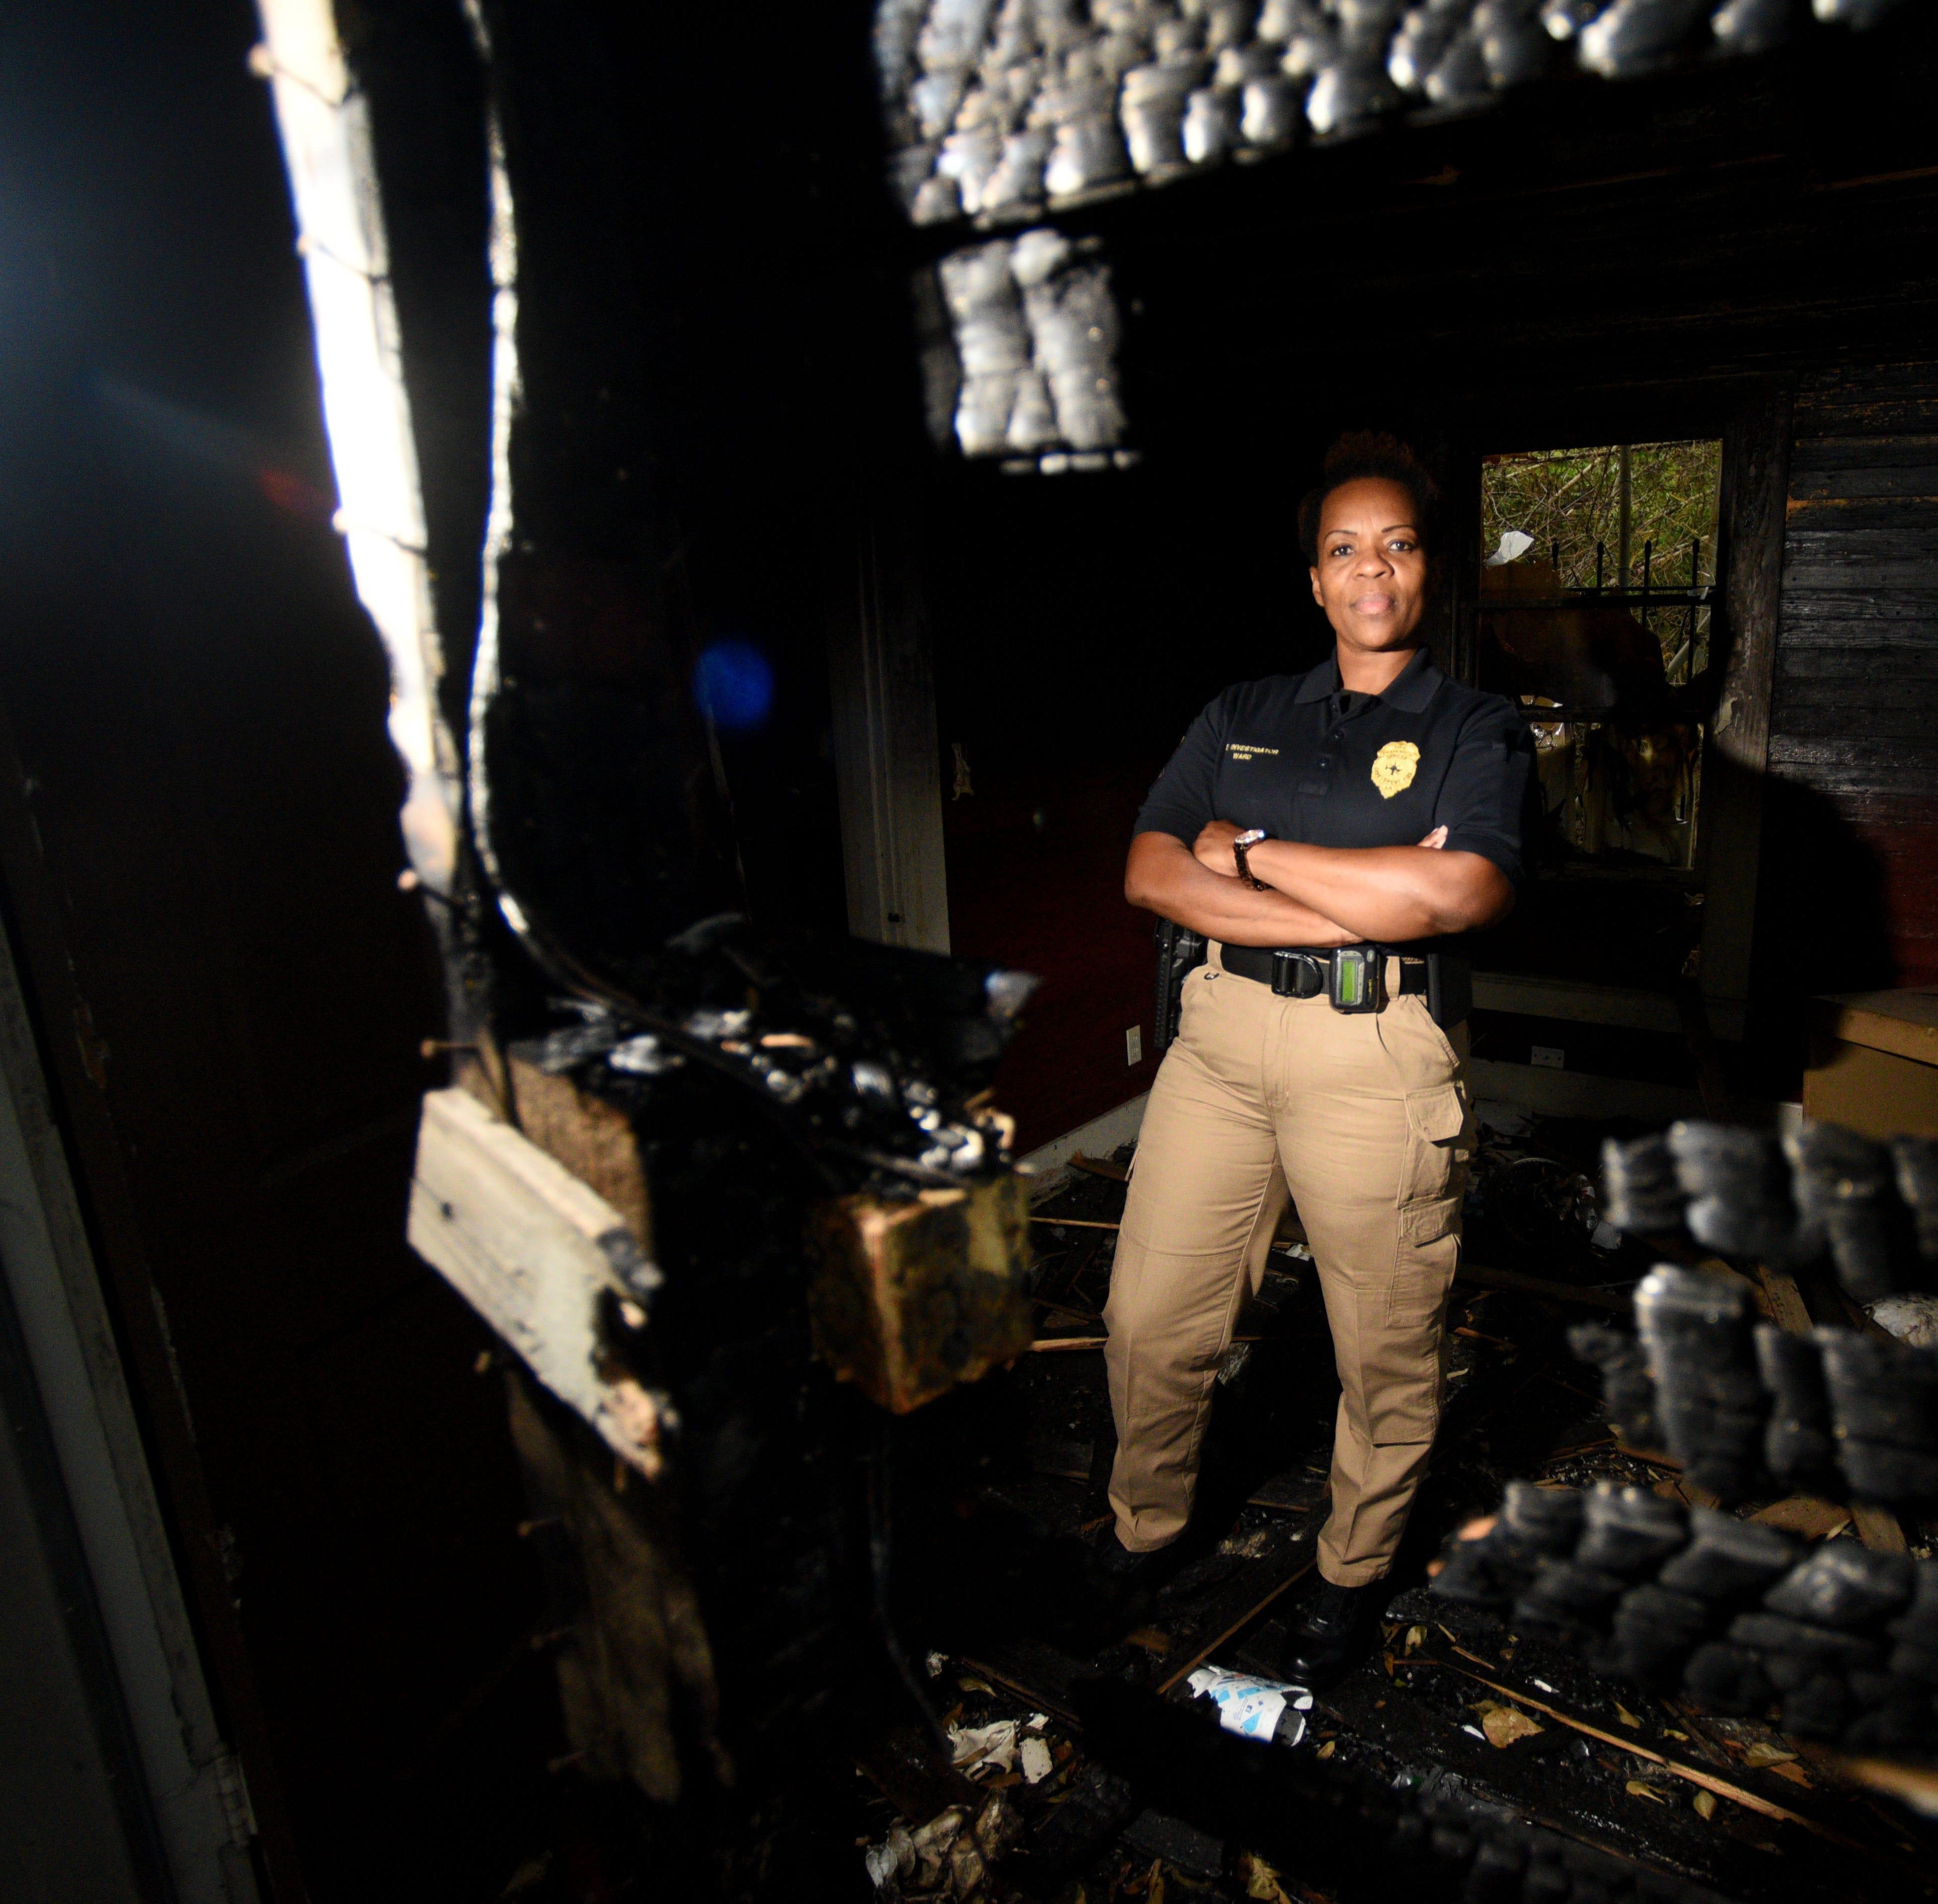 'Never say never'; Janet Ward becomes Shreveport's first female arson investigator